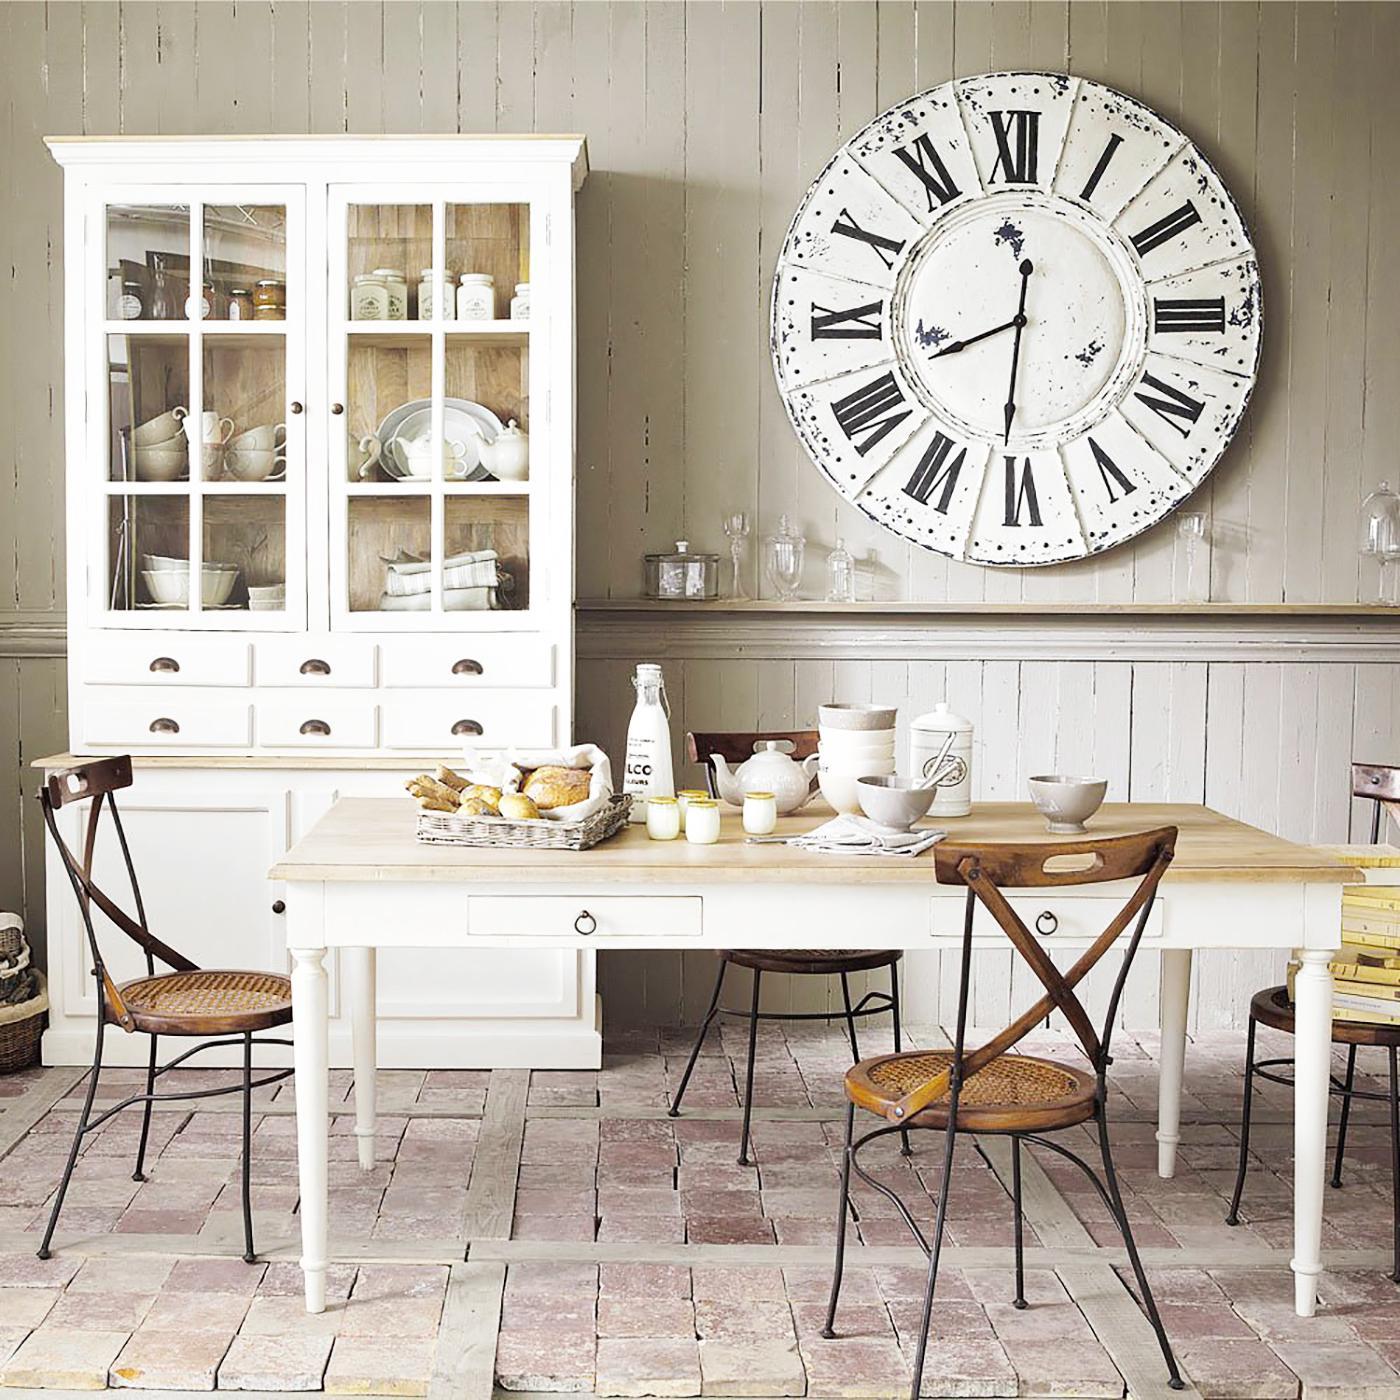 dekor ljunk h s t feh rrel lak skult ra magazin. Black Bedroom Furniture Sets. Home Design Ideas